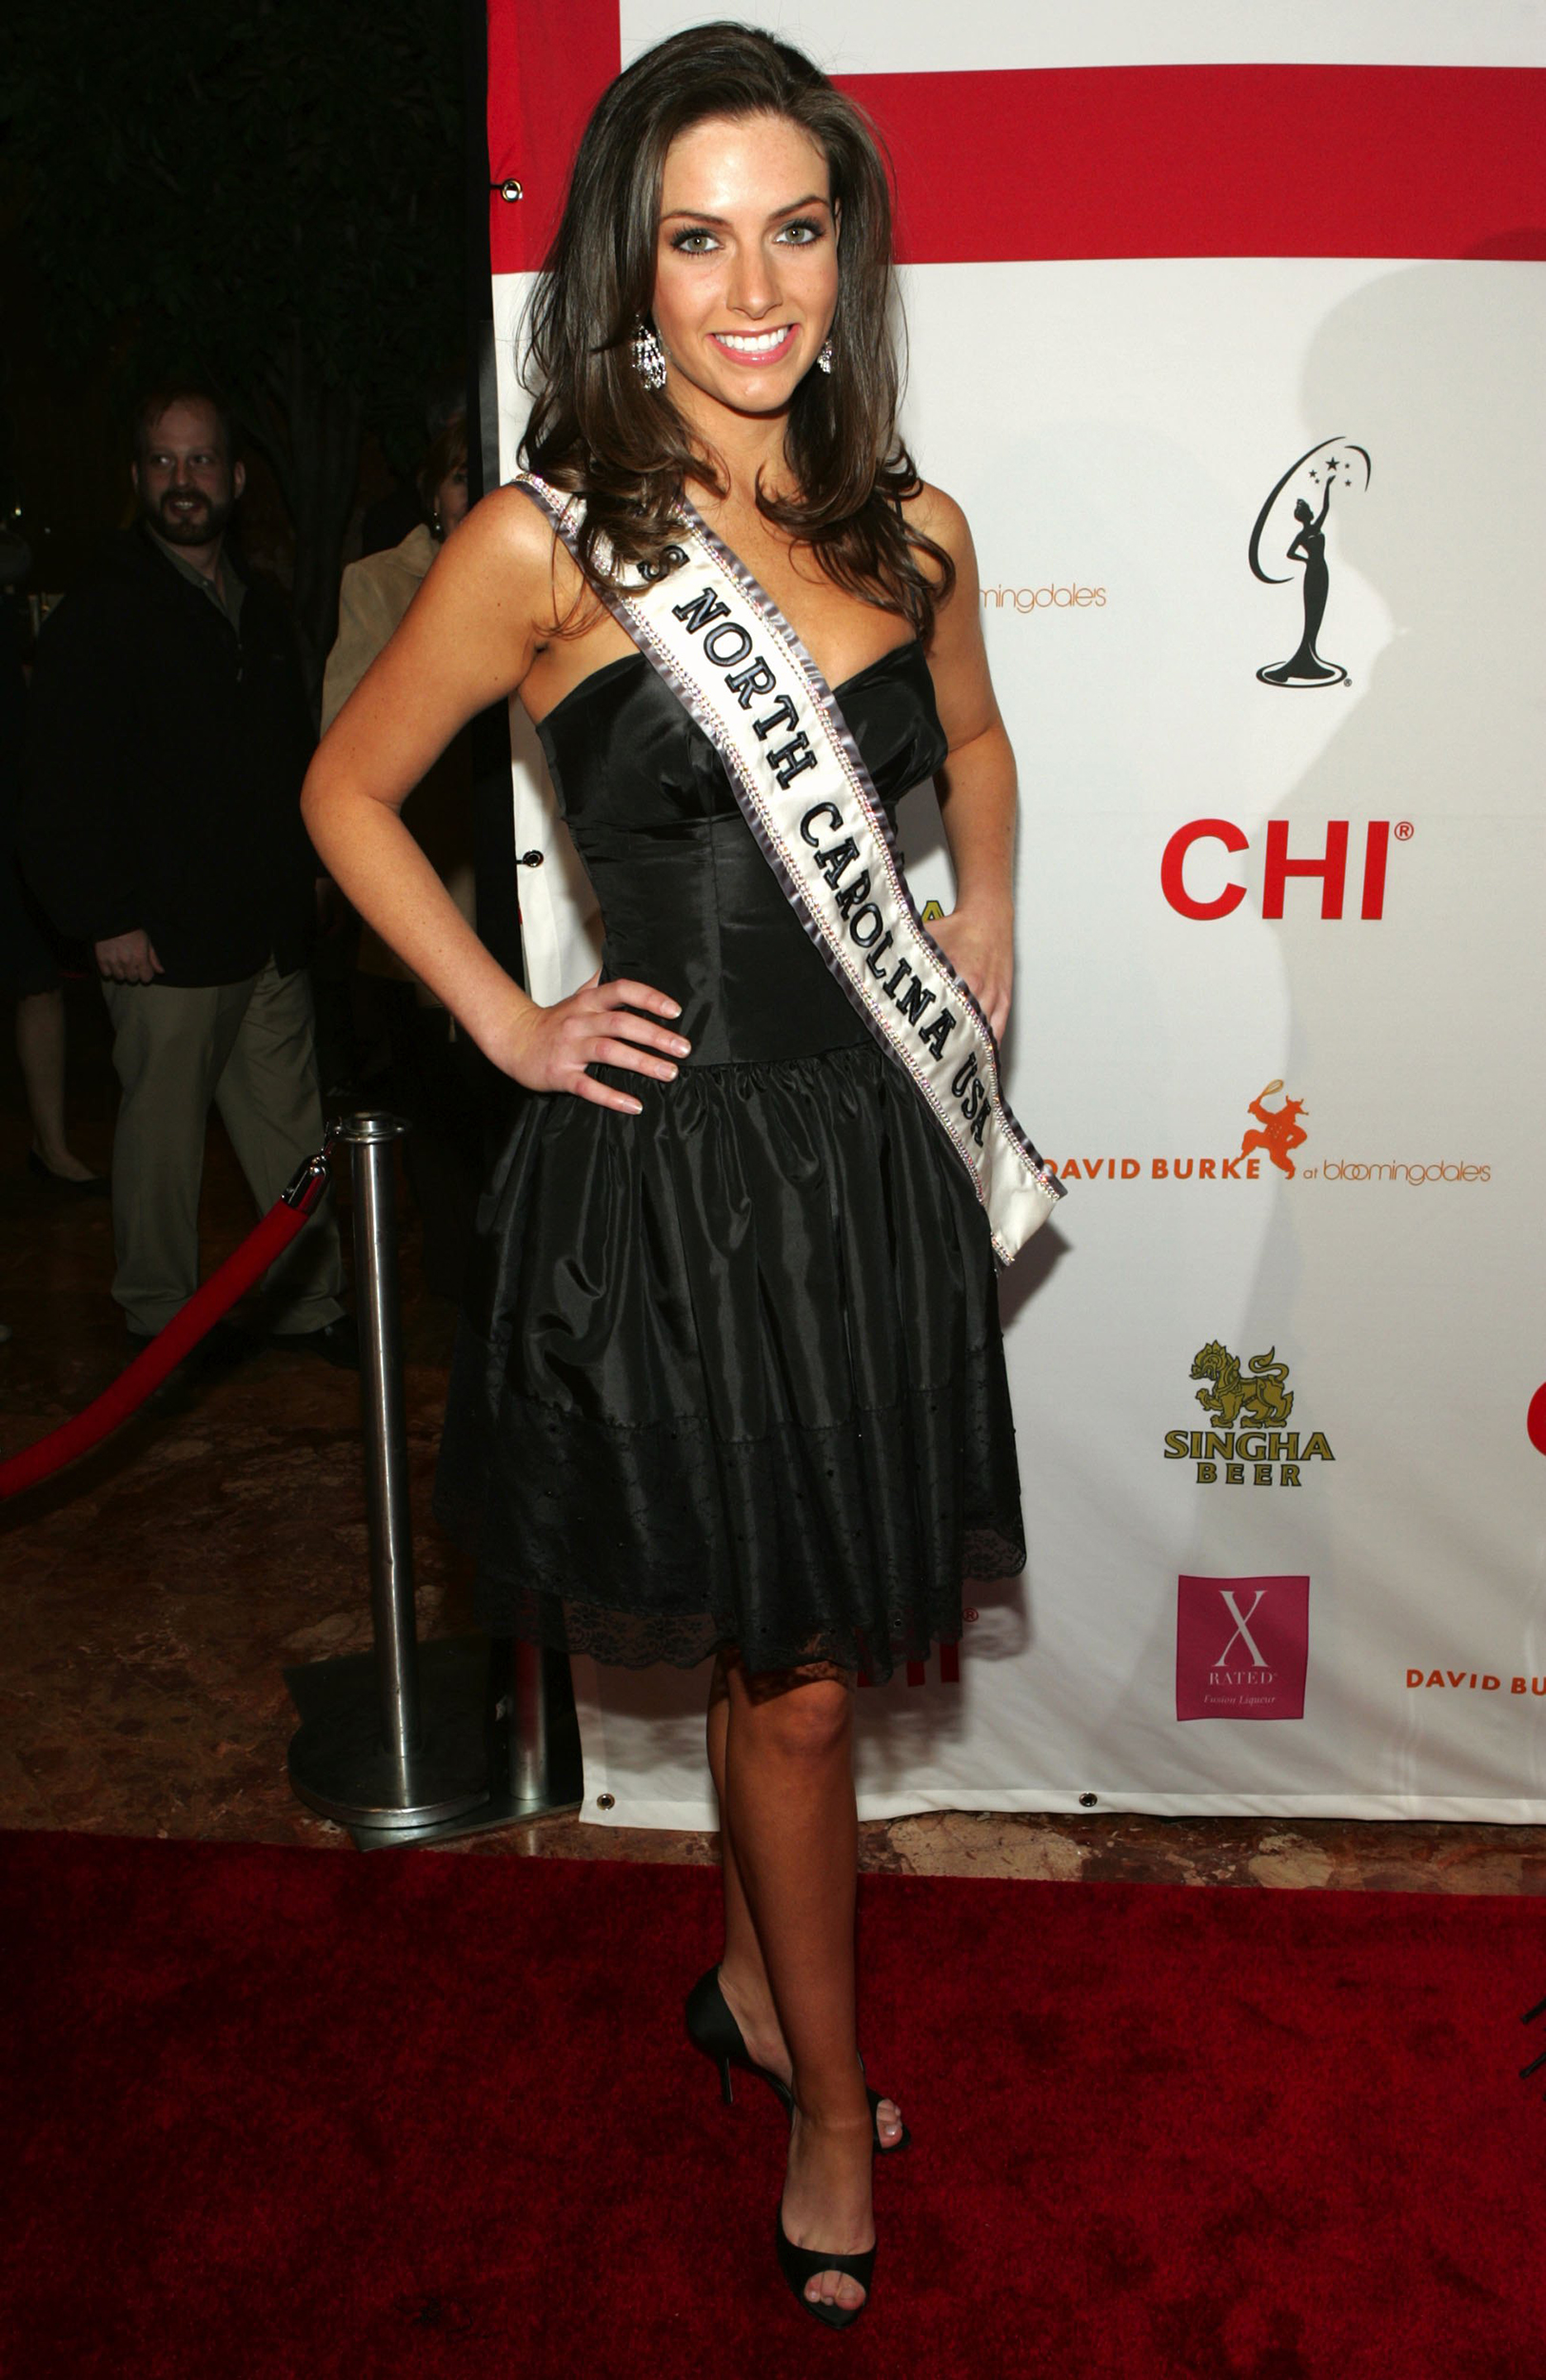 nbcnews.com - Opinion | Former Miss USA hopeful: Trump 'eyed me like a piece of meat'